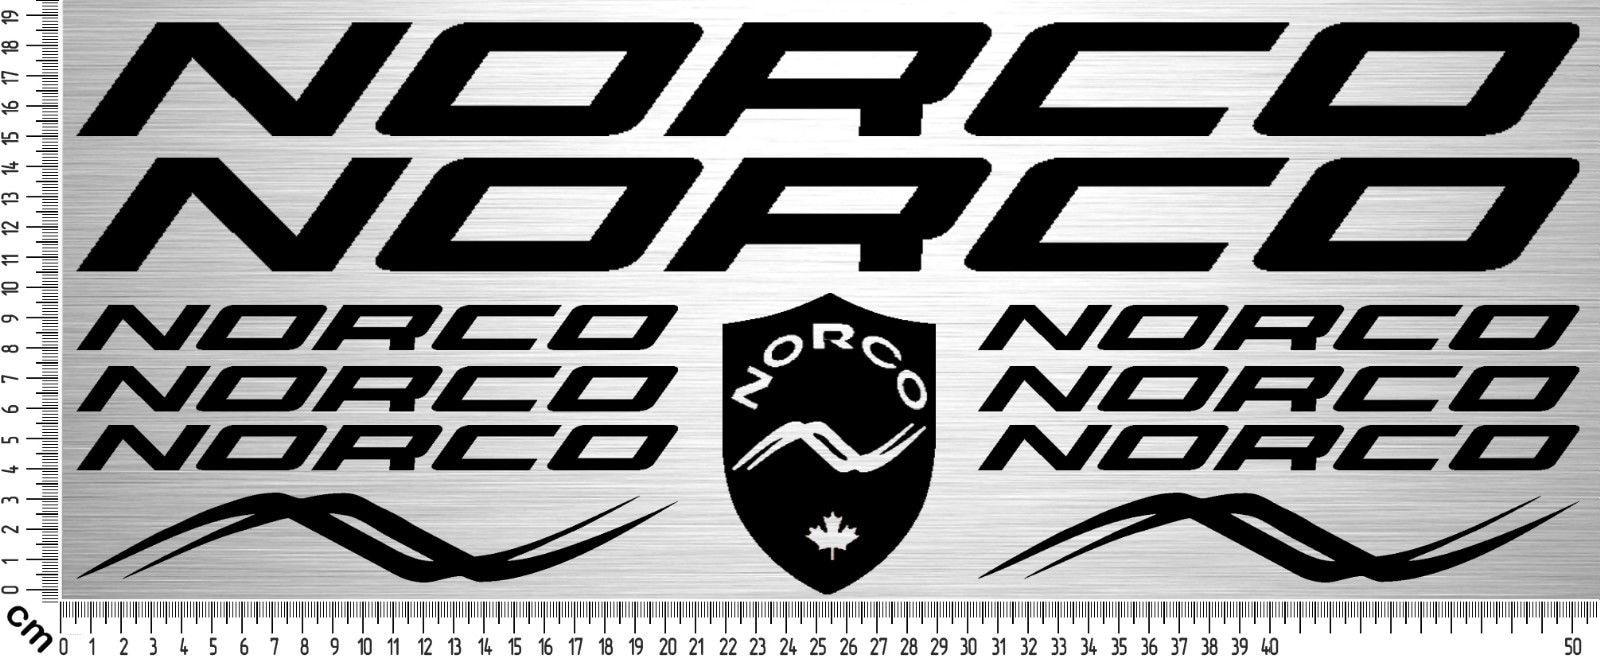 For 11x NORCO BIKES Sticker Set   Fahrrad Rahmen Aufkleber   Bike Frame Sticker   11 Stk Car Styling